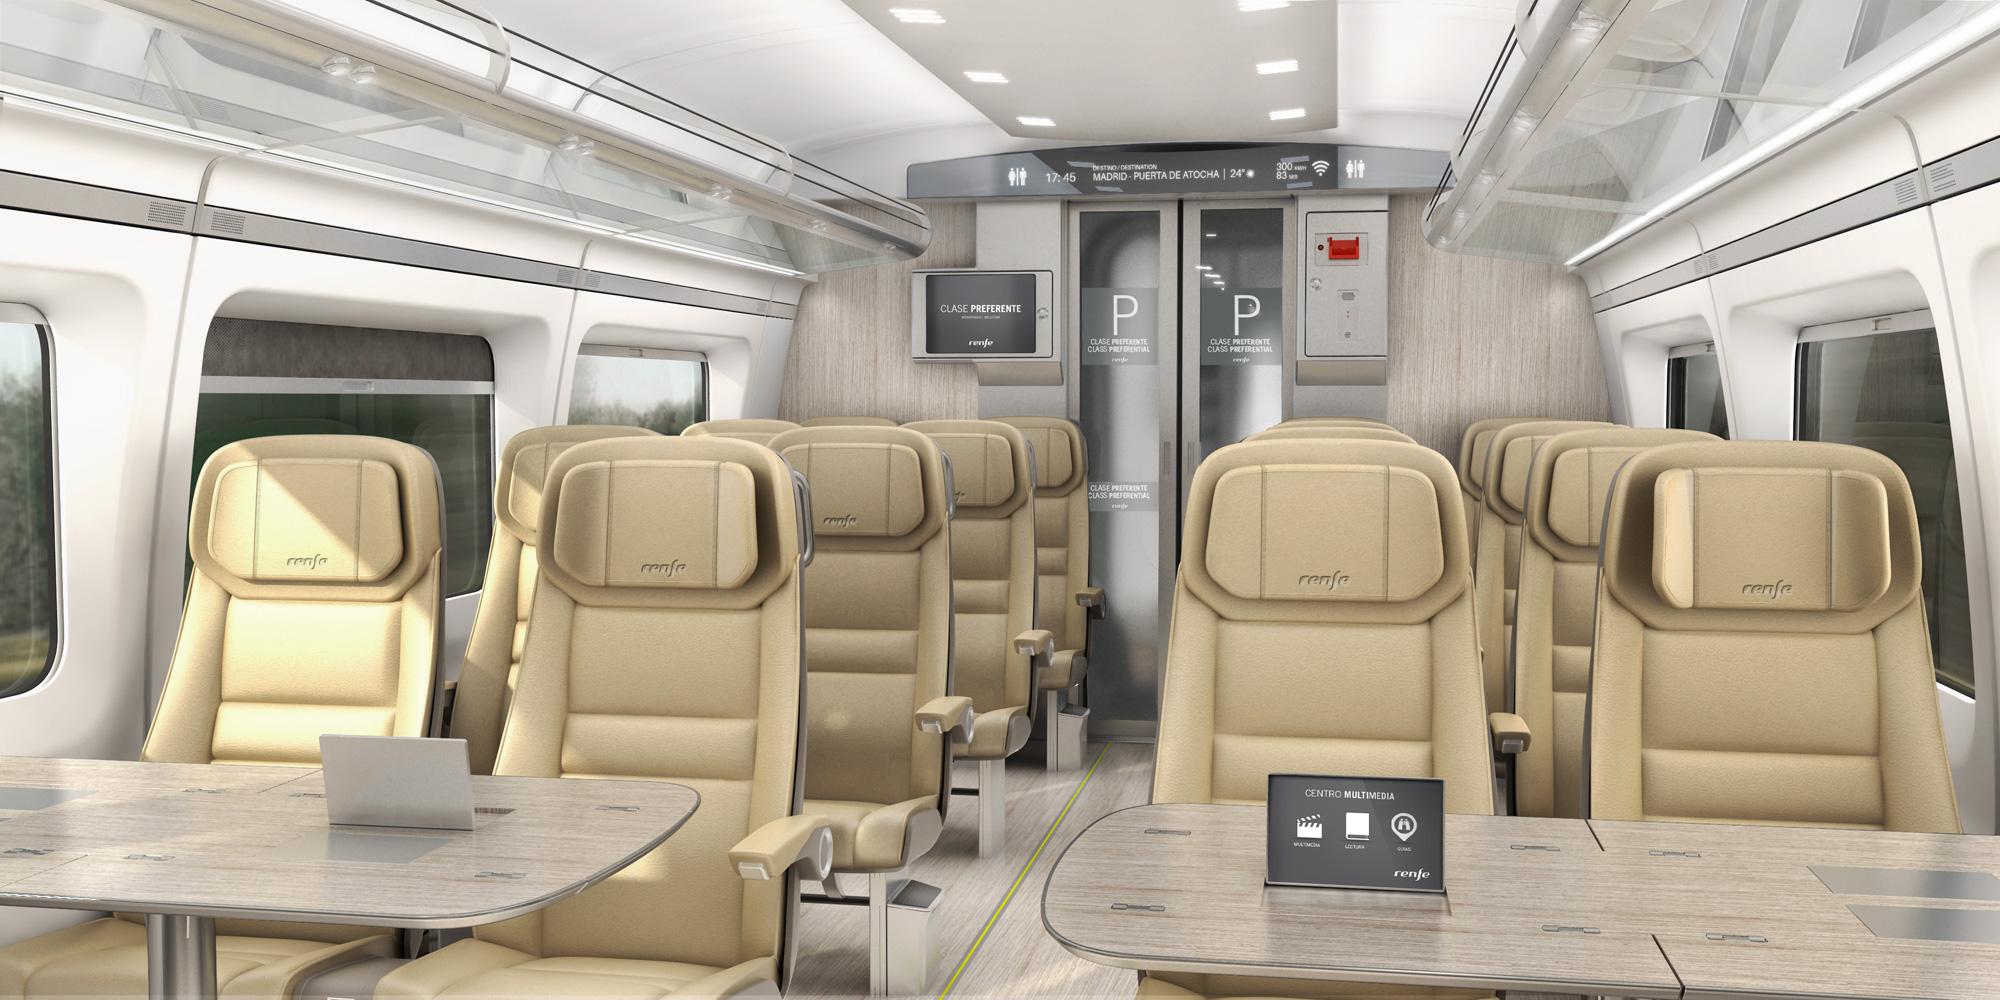 Interior design of the Renfe Avril: 'Preferente' class